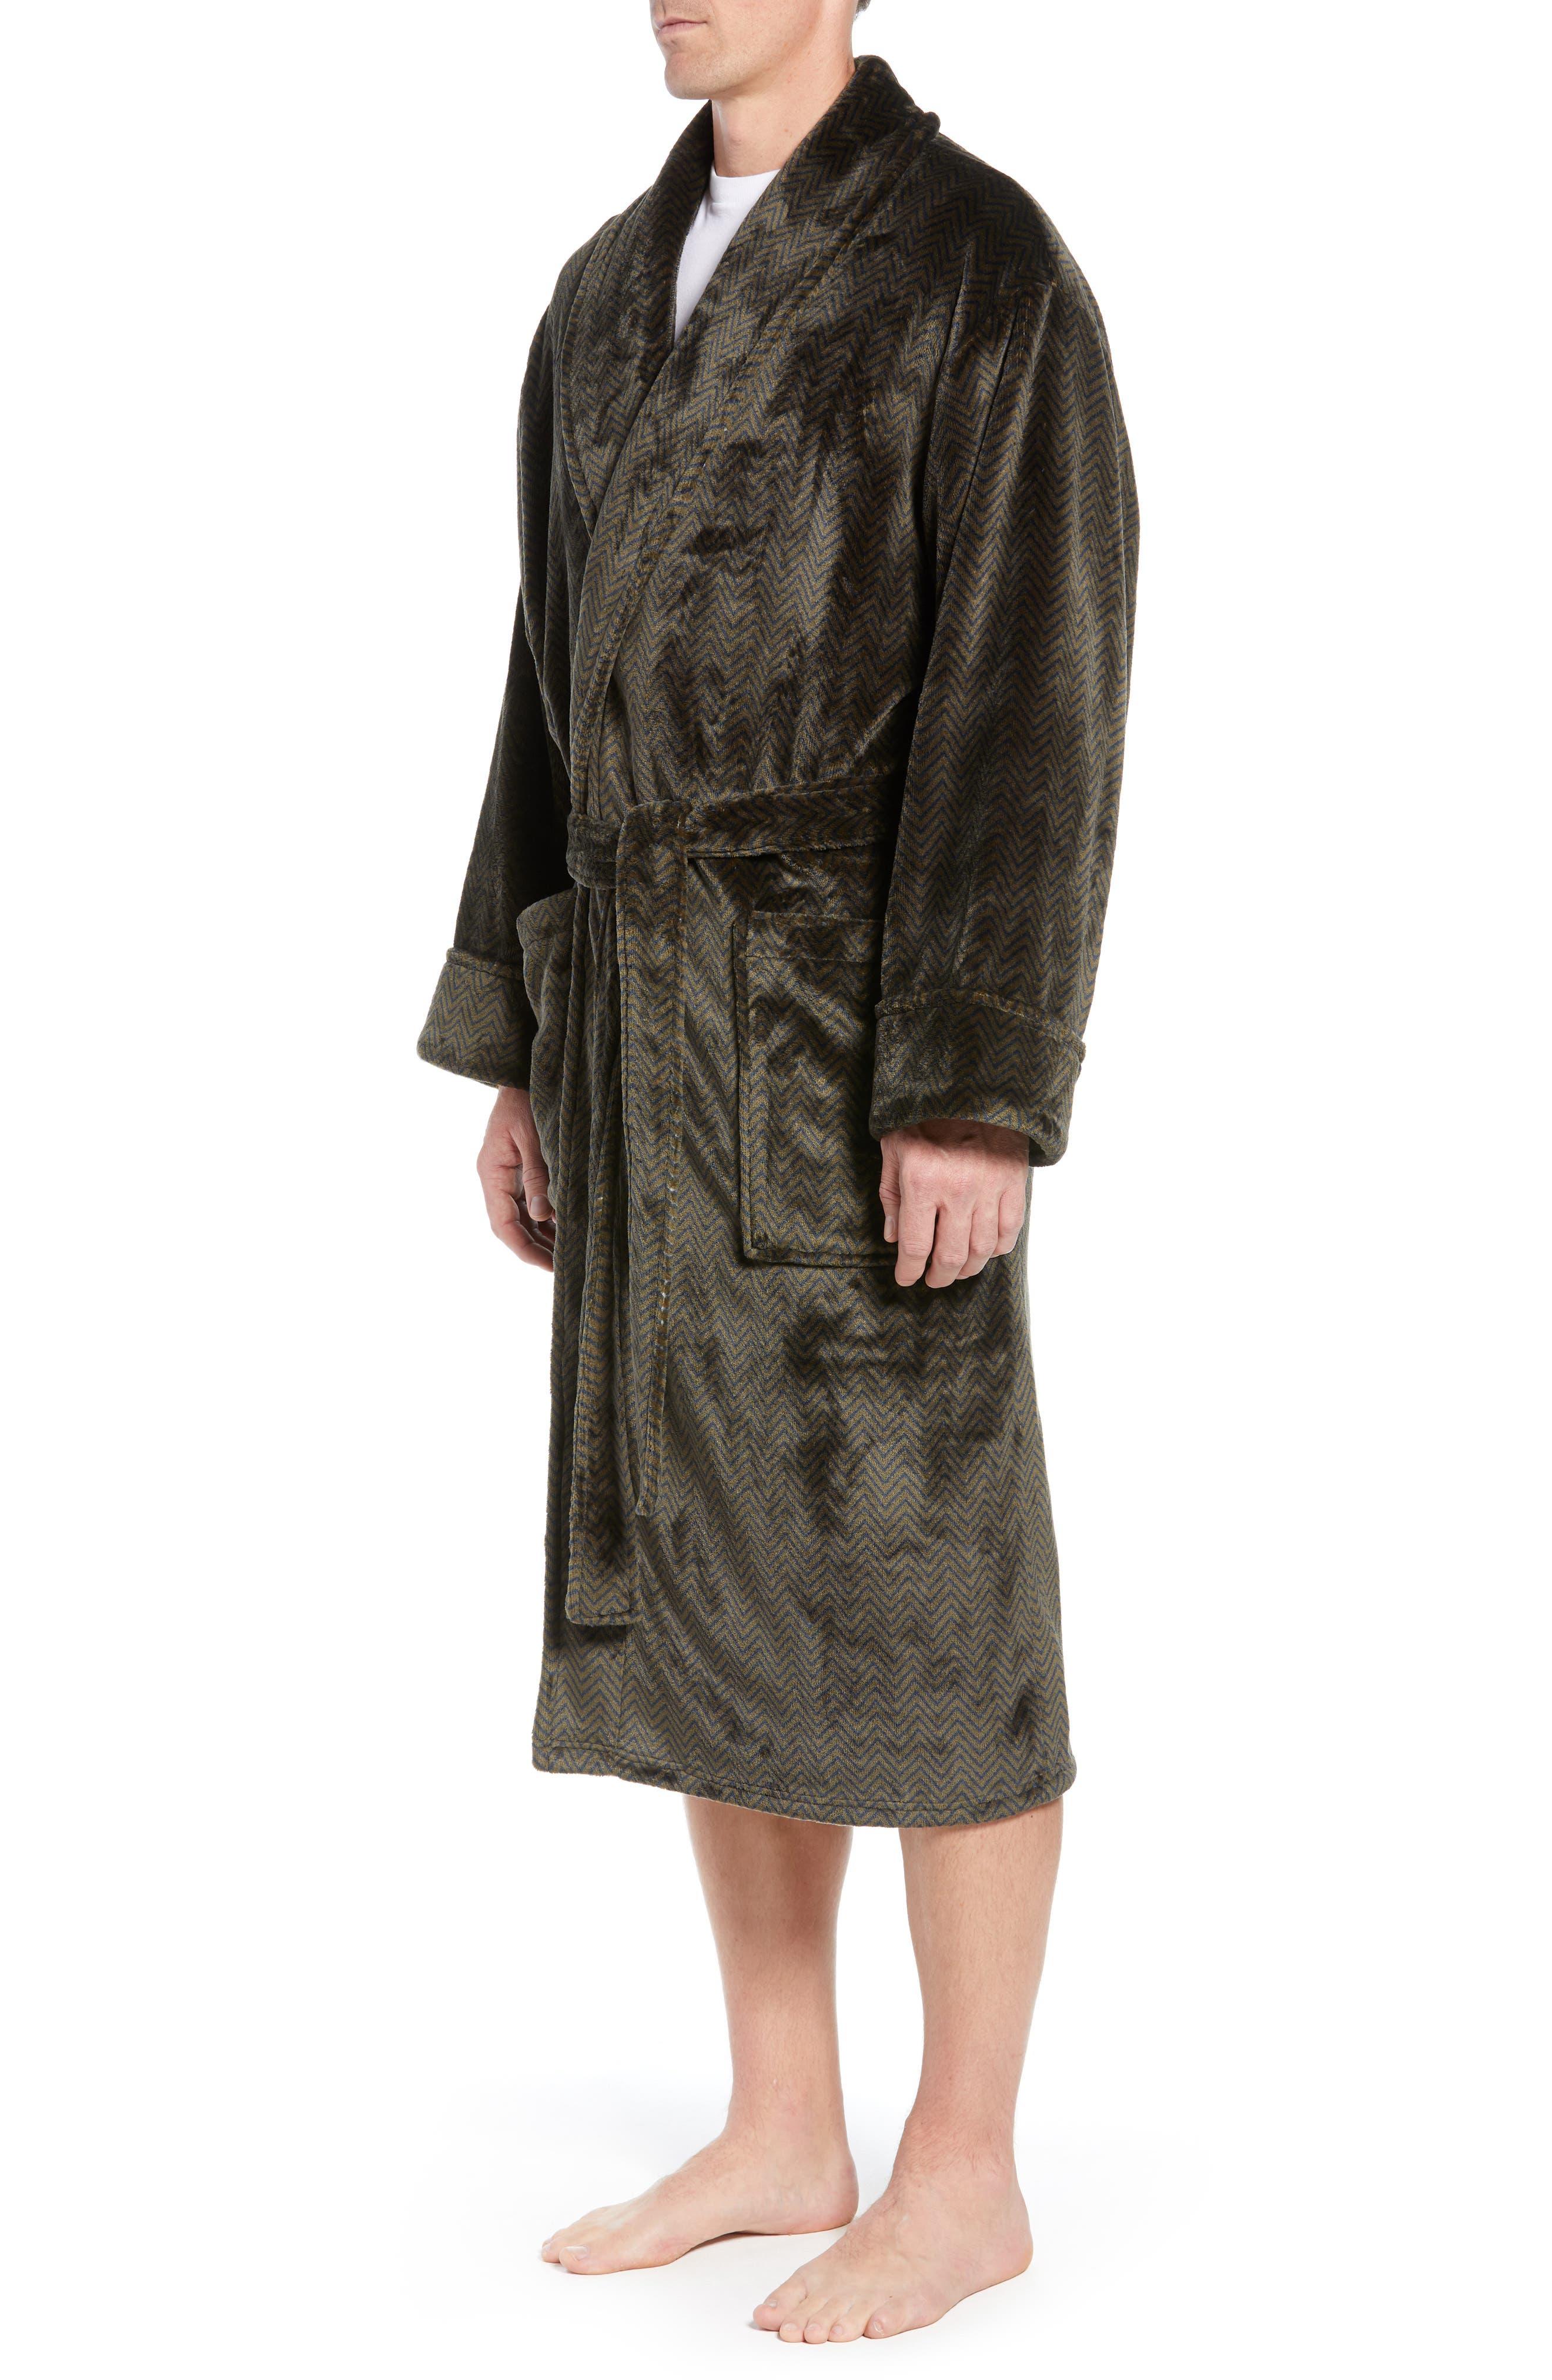 DANIEL BUCHLER, Chevron Fleece Robe, Alternate thumbnail 3, color, ARMY/ MIDNIGHT